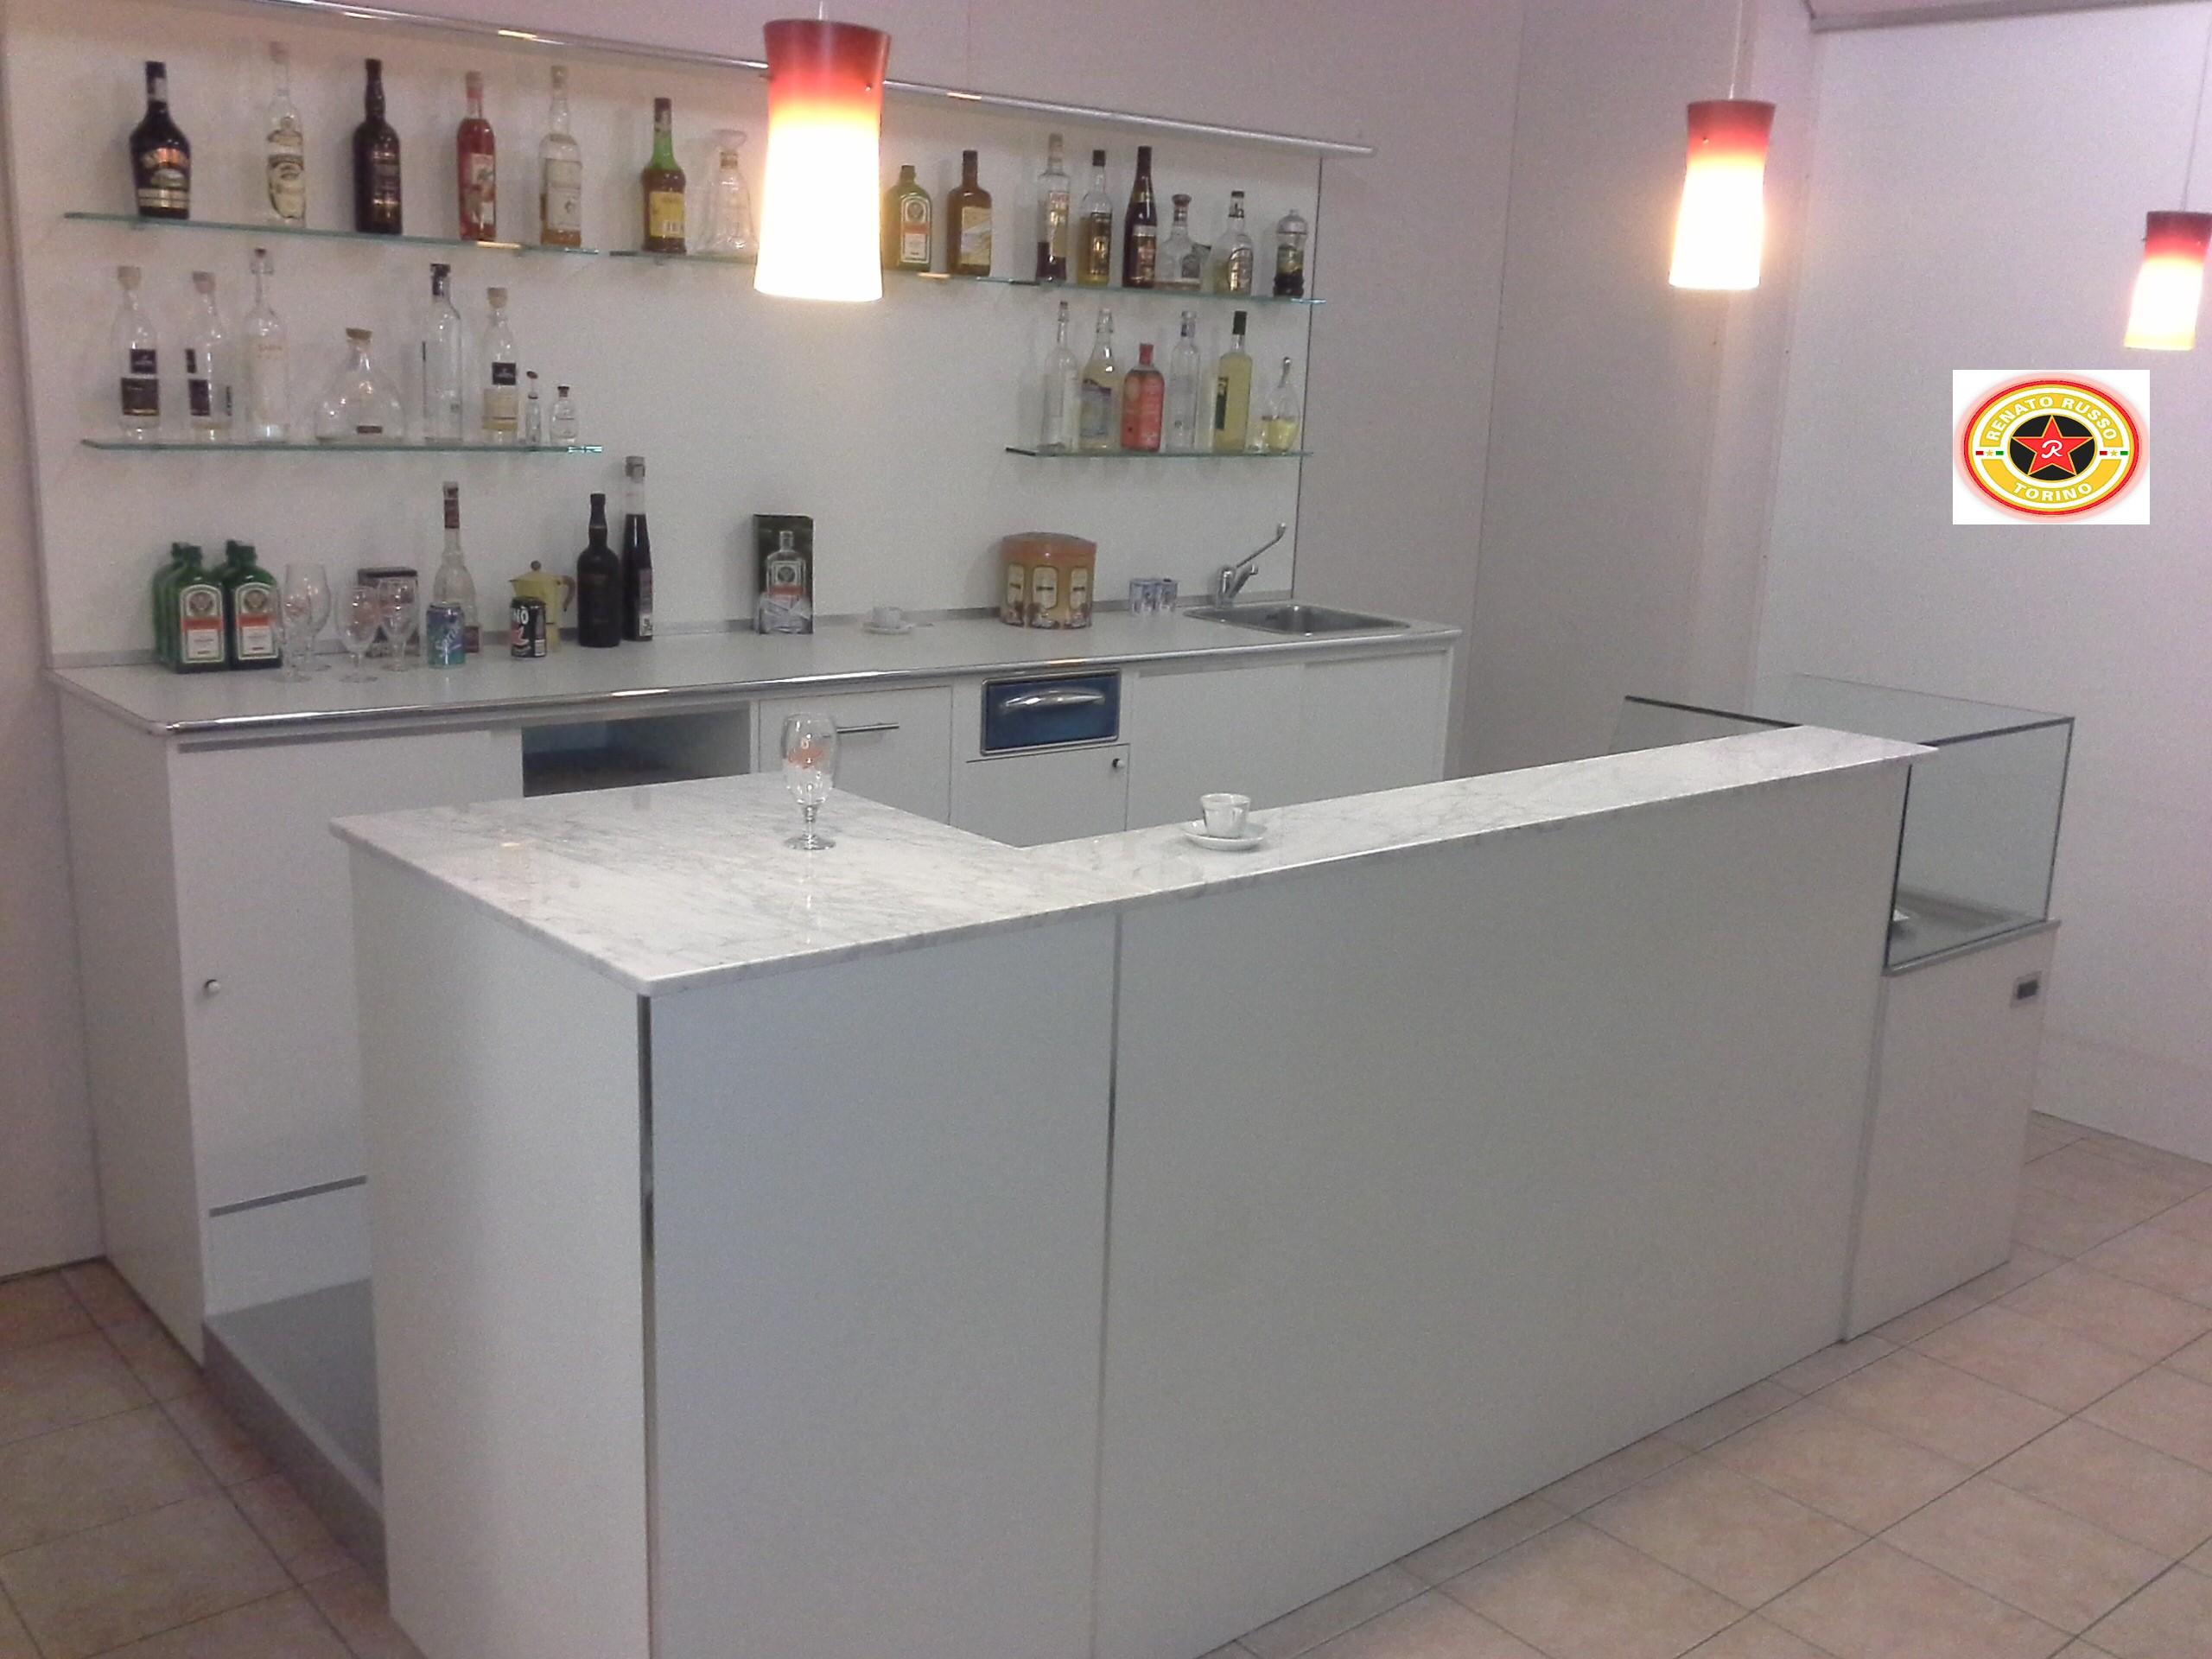 Banchi bar compra in fabbrica a met prezzo novit bar for Opzioni di rivestimenti leggeri